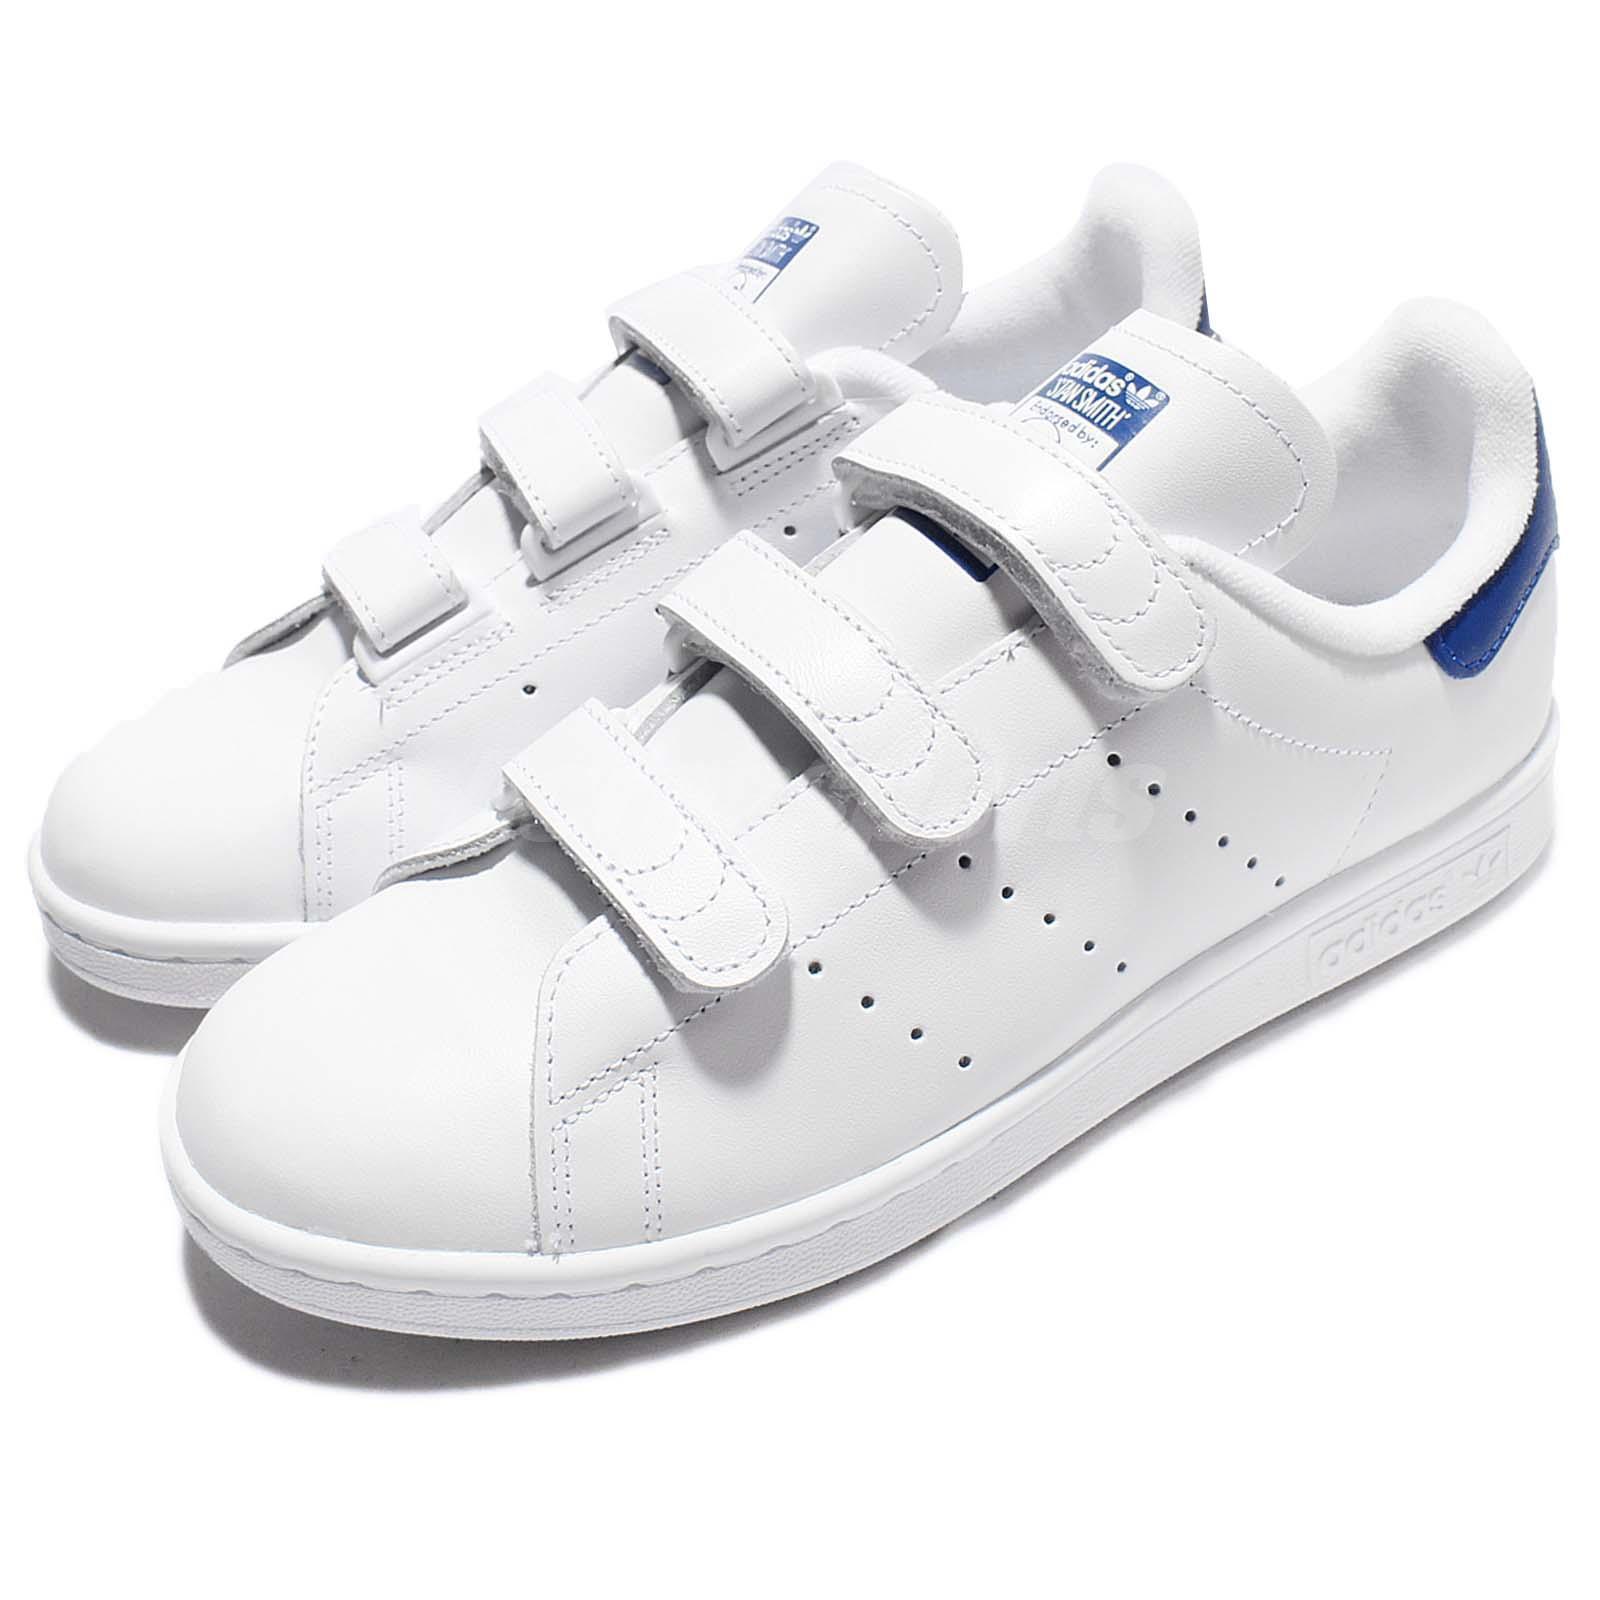 adidas Originals Stan Smith CF White Blue Leather Men Classic Shoes S80042